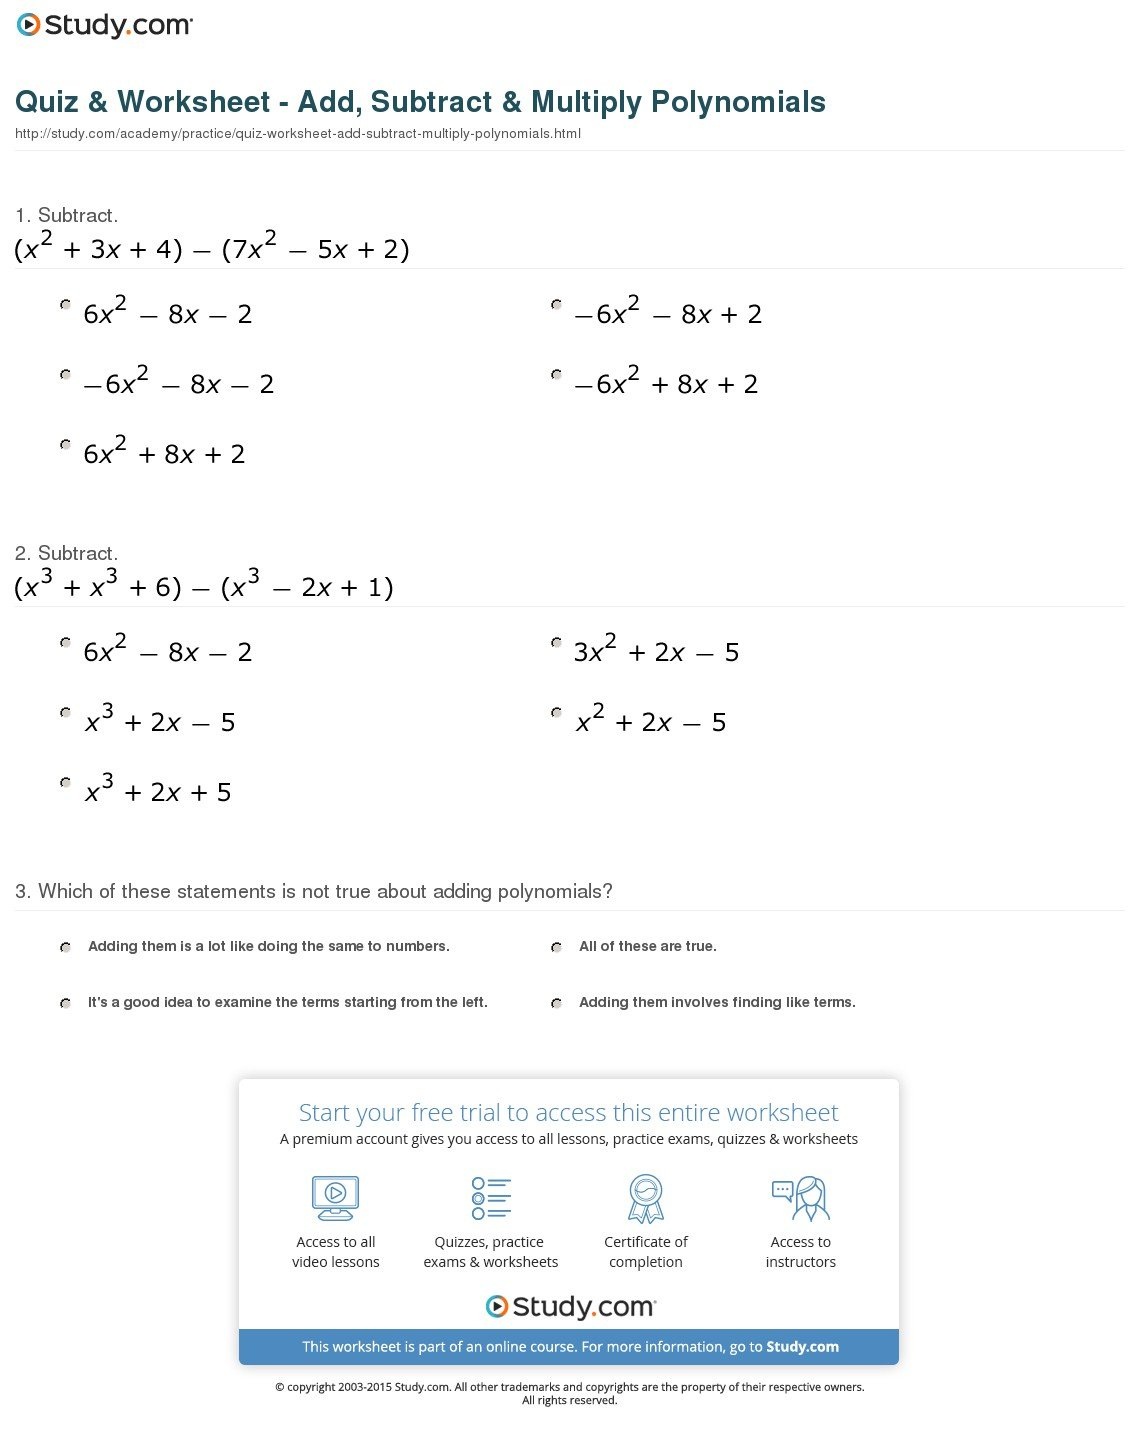 Multiplying Polynomials Worksheet Algebra 2